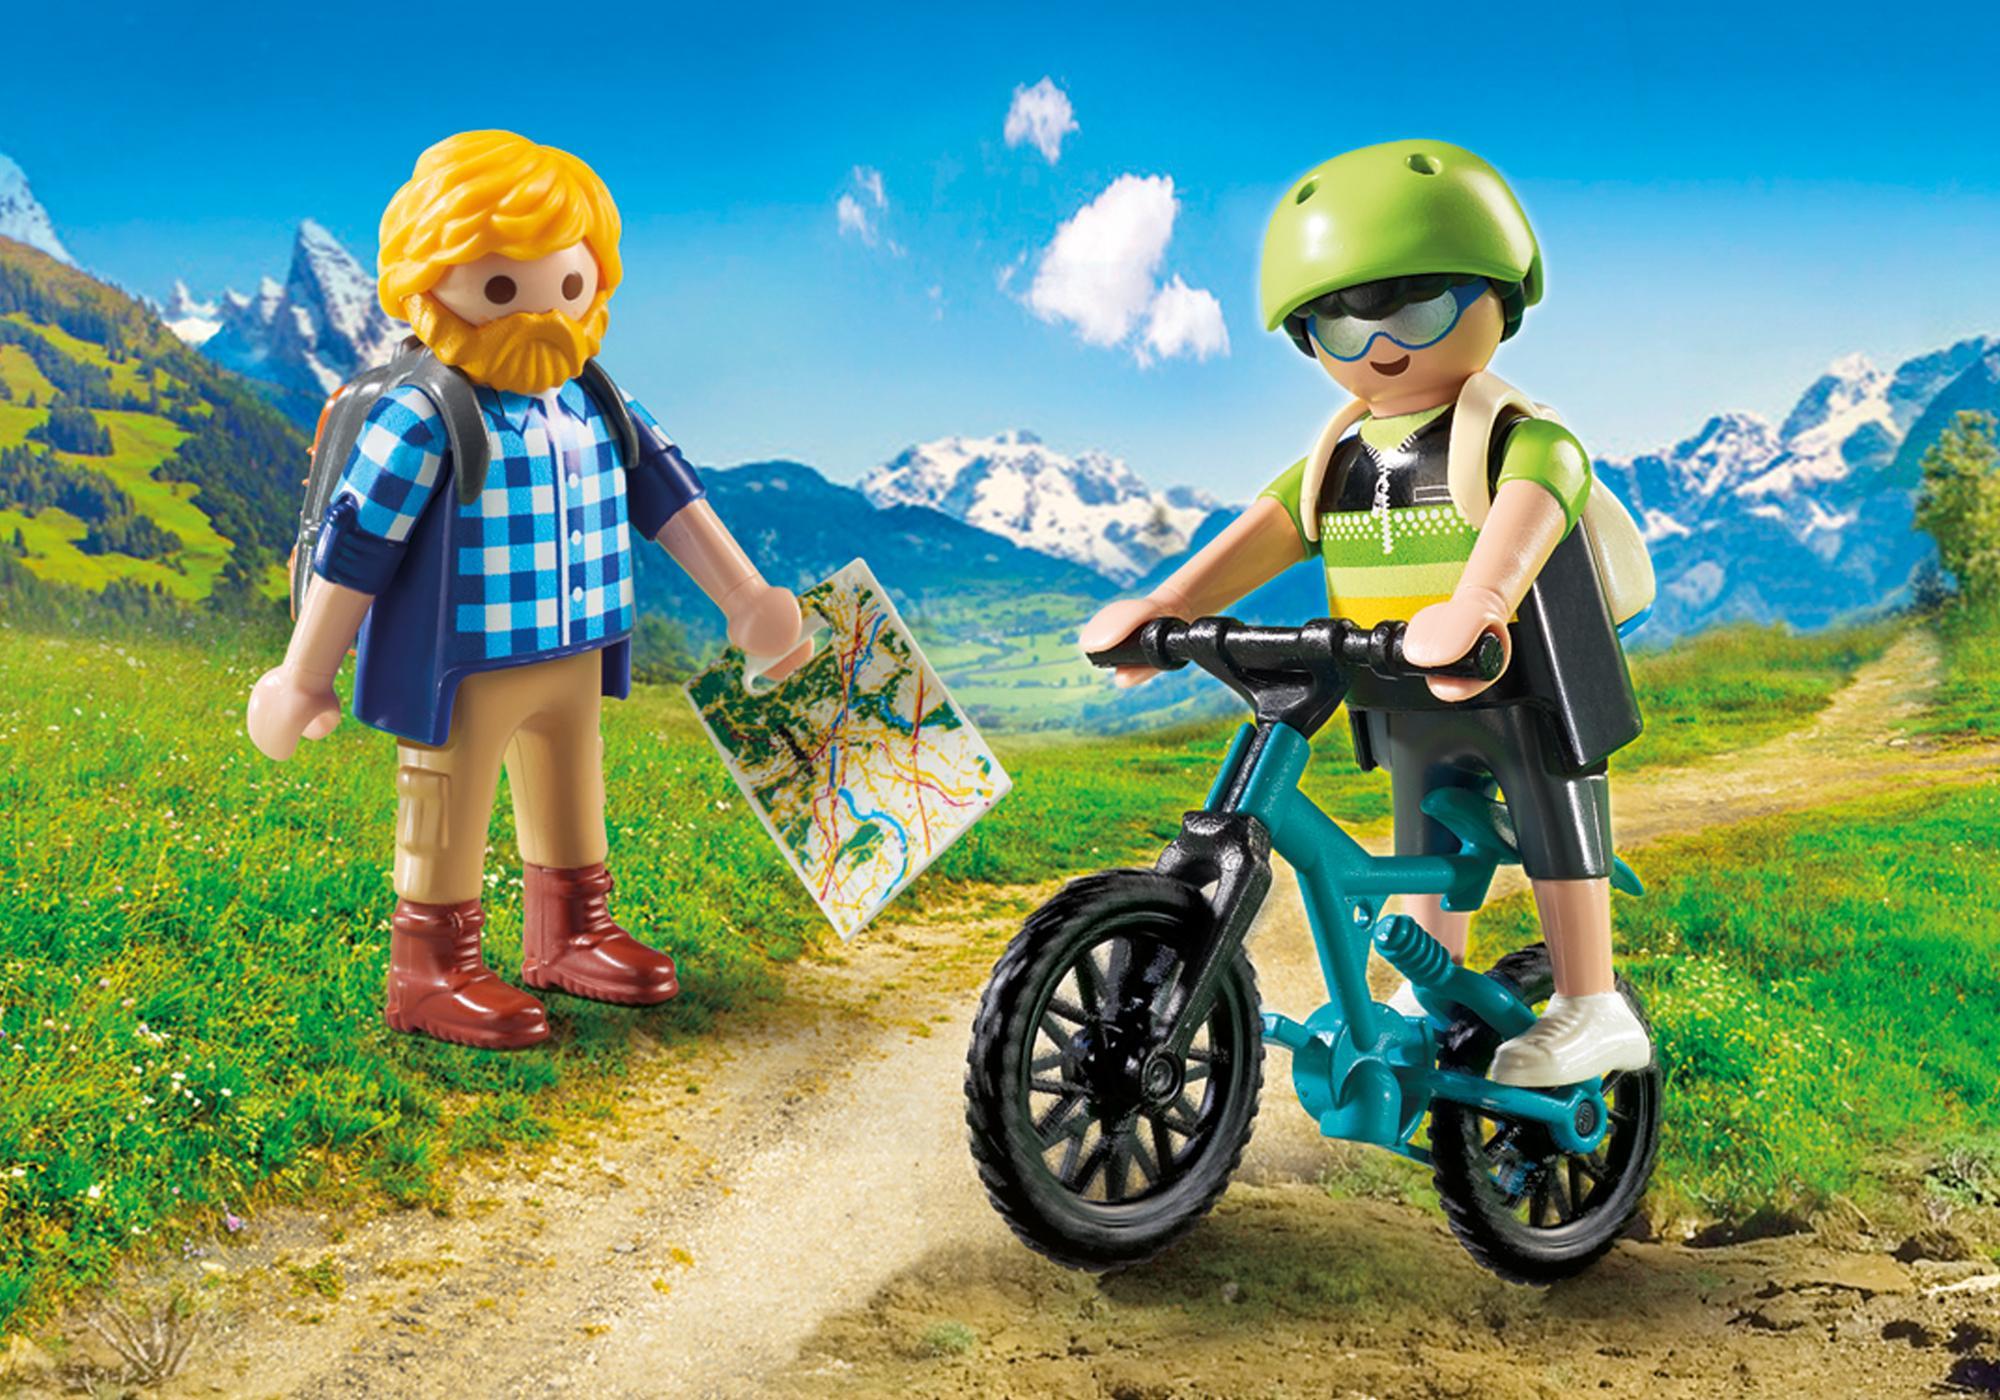 9129_product_detail/Ποδηλάτης και ορειβάτης